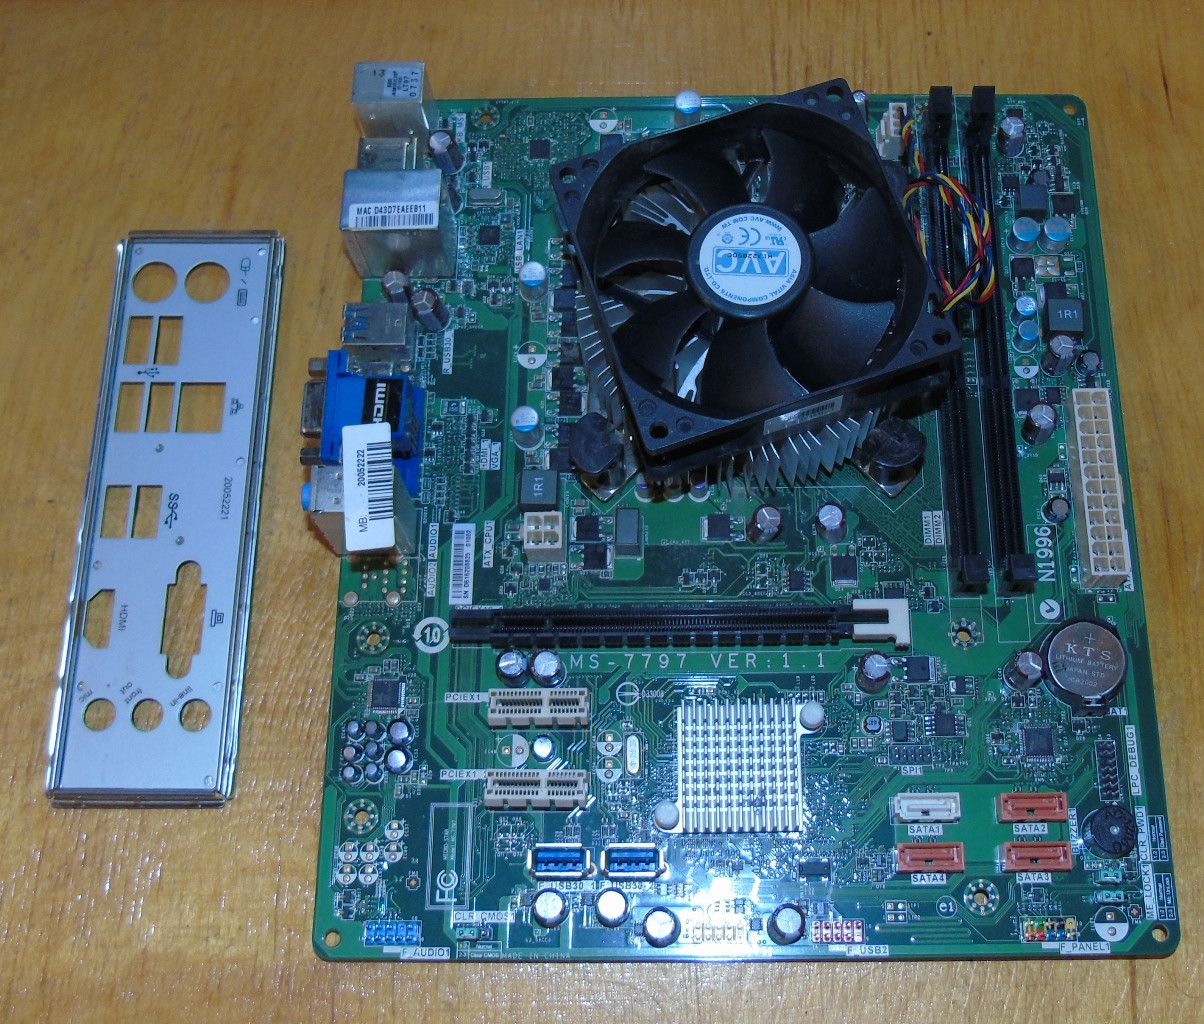 1155 Материнская плата MSI MS-7797 Ver 1.1 + Процессор Intel Core i3 3220 @